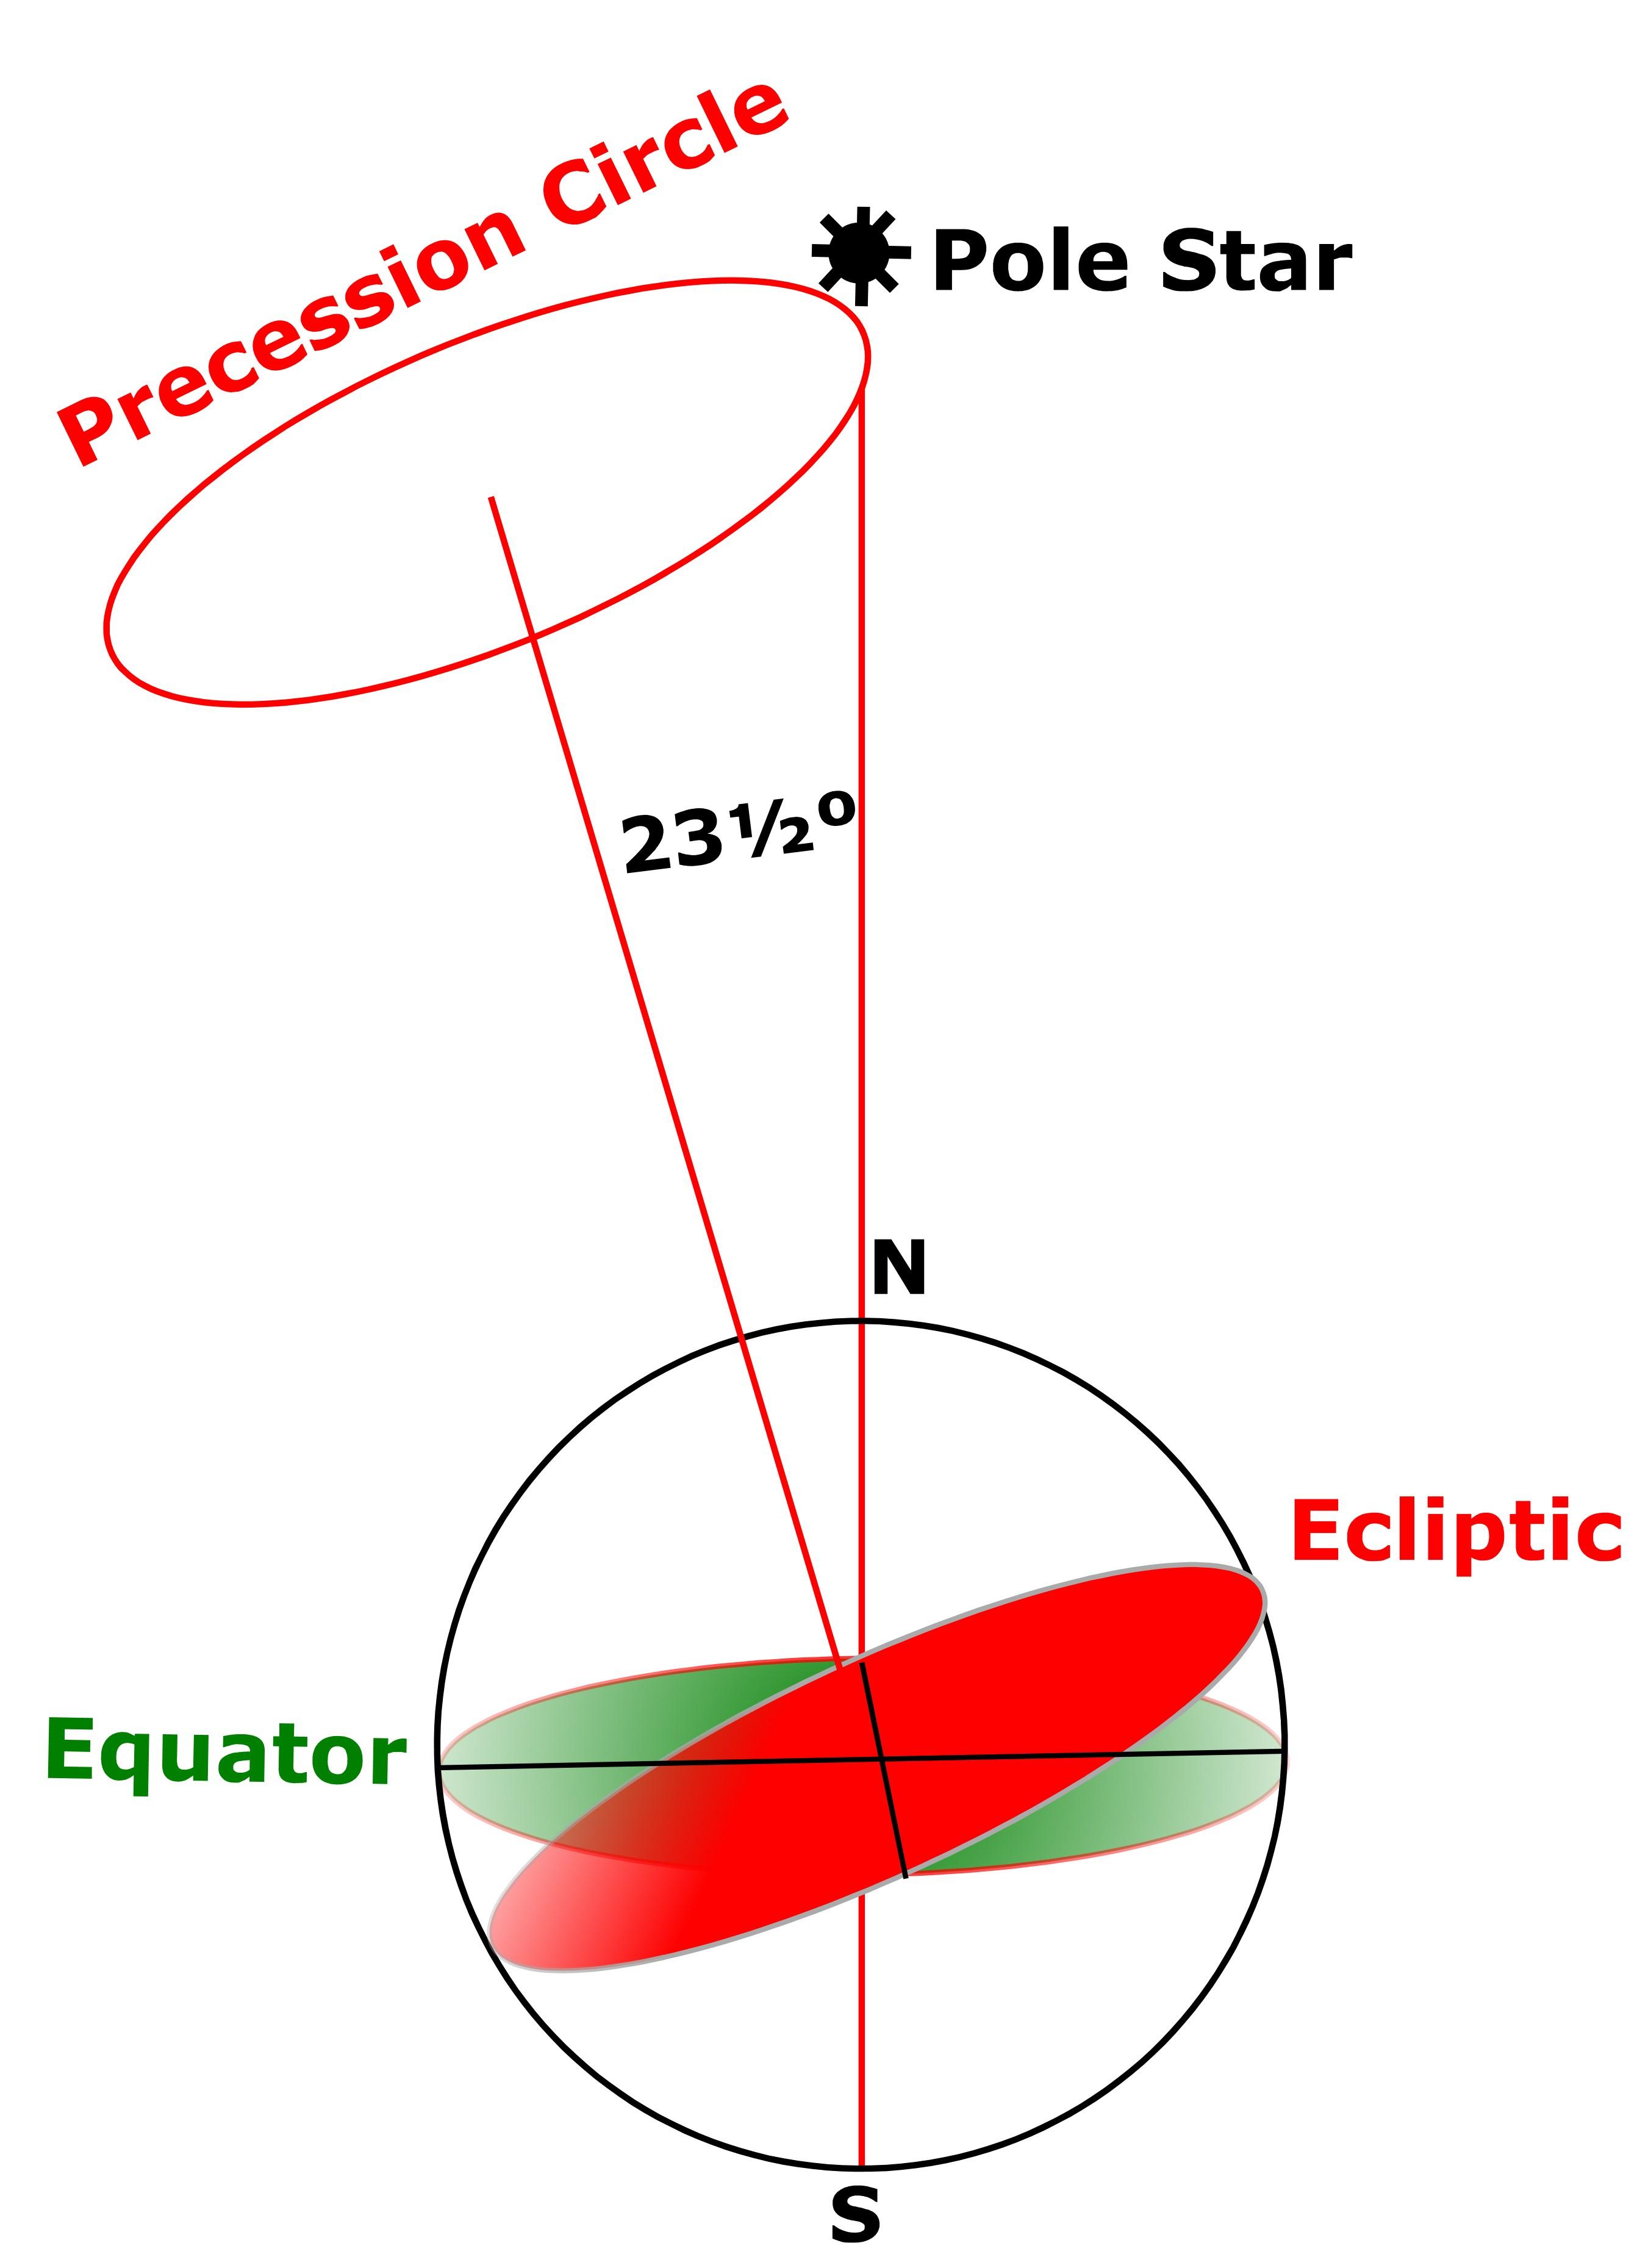 Precession of the Earth's polar axis